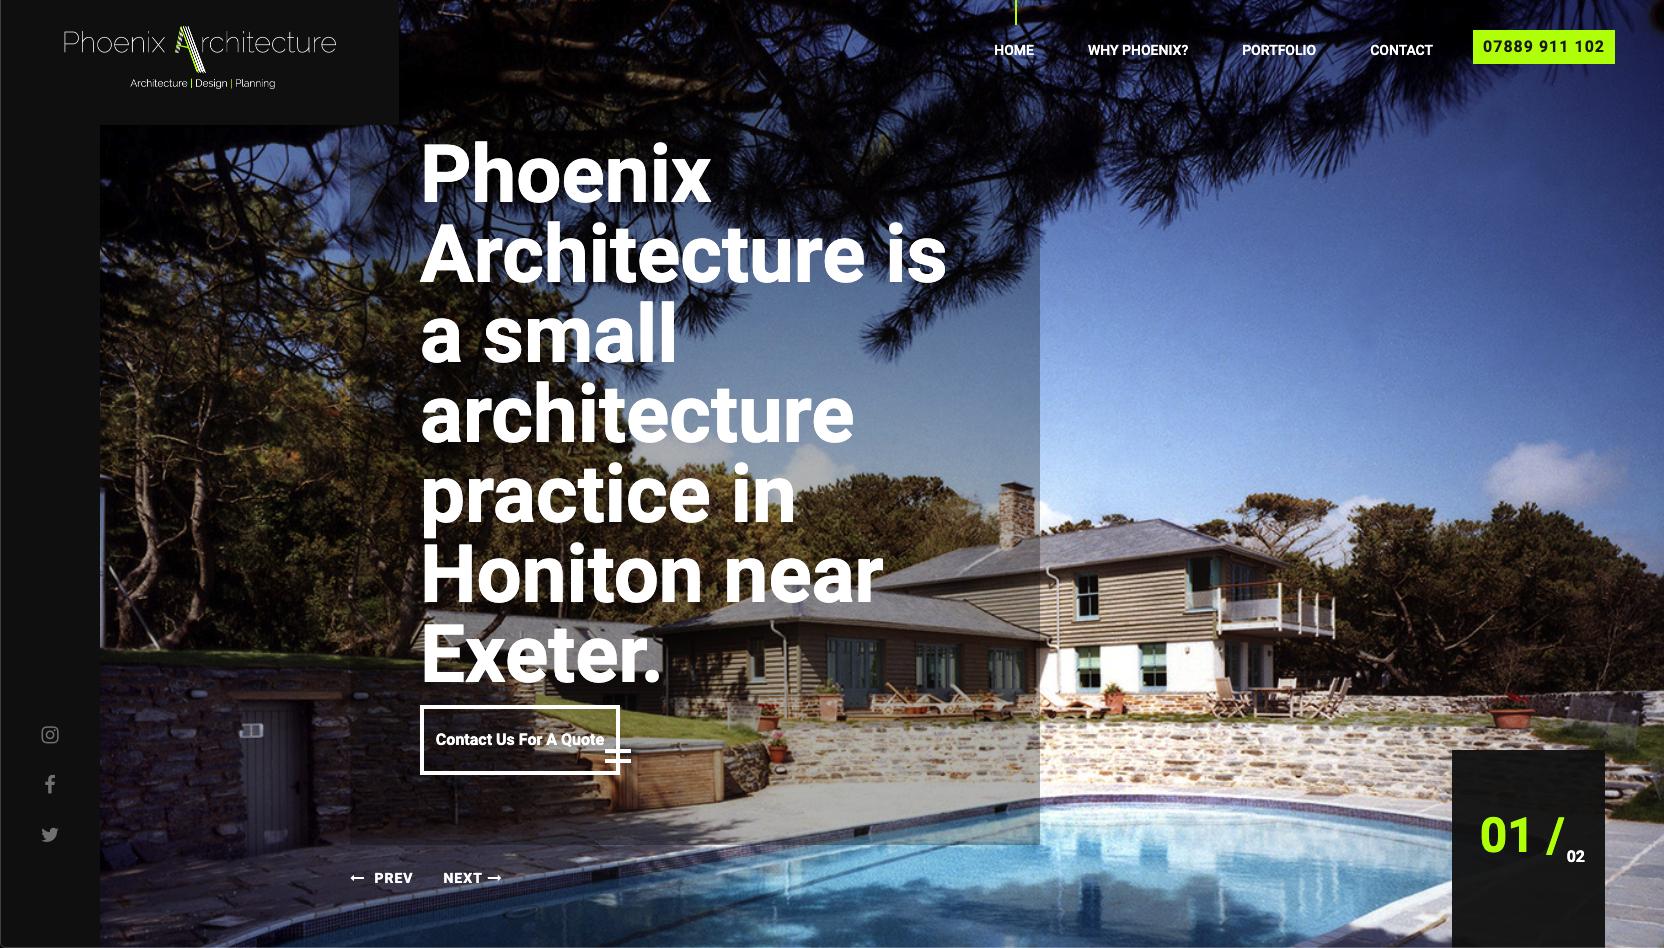 Phoenix Architecture